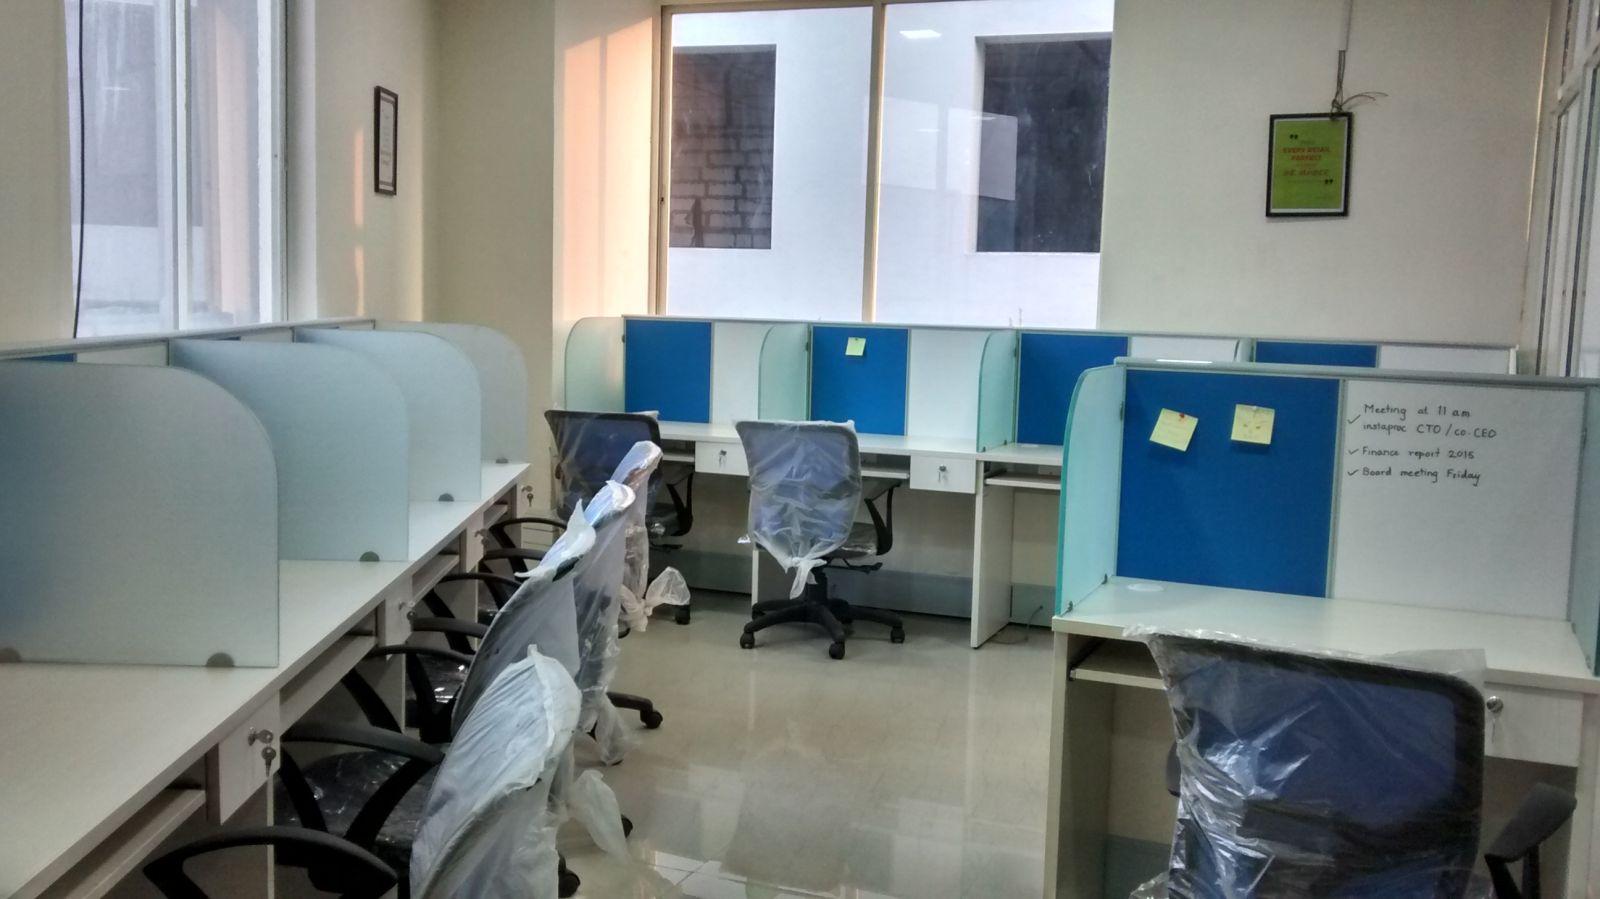 TRIOS, Pune - Read Reviews & Book Online